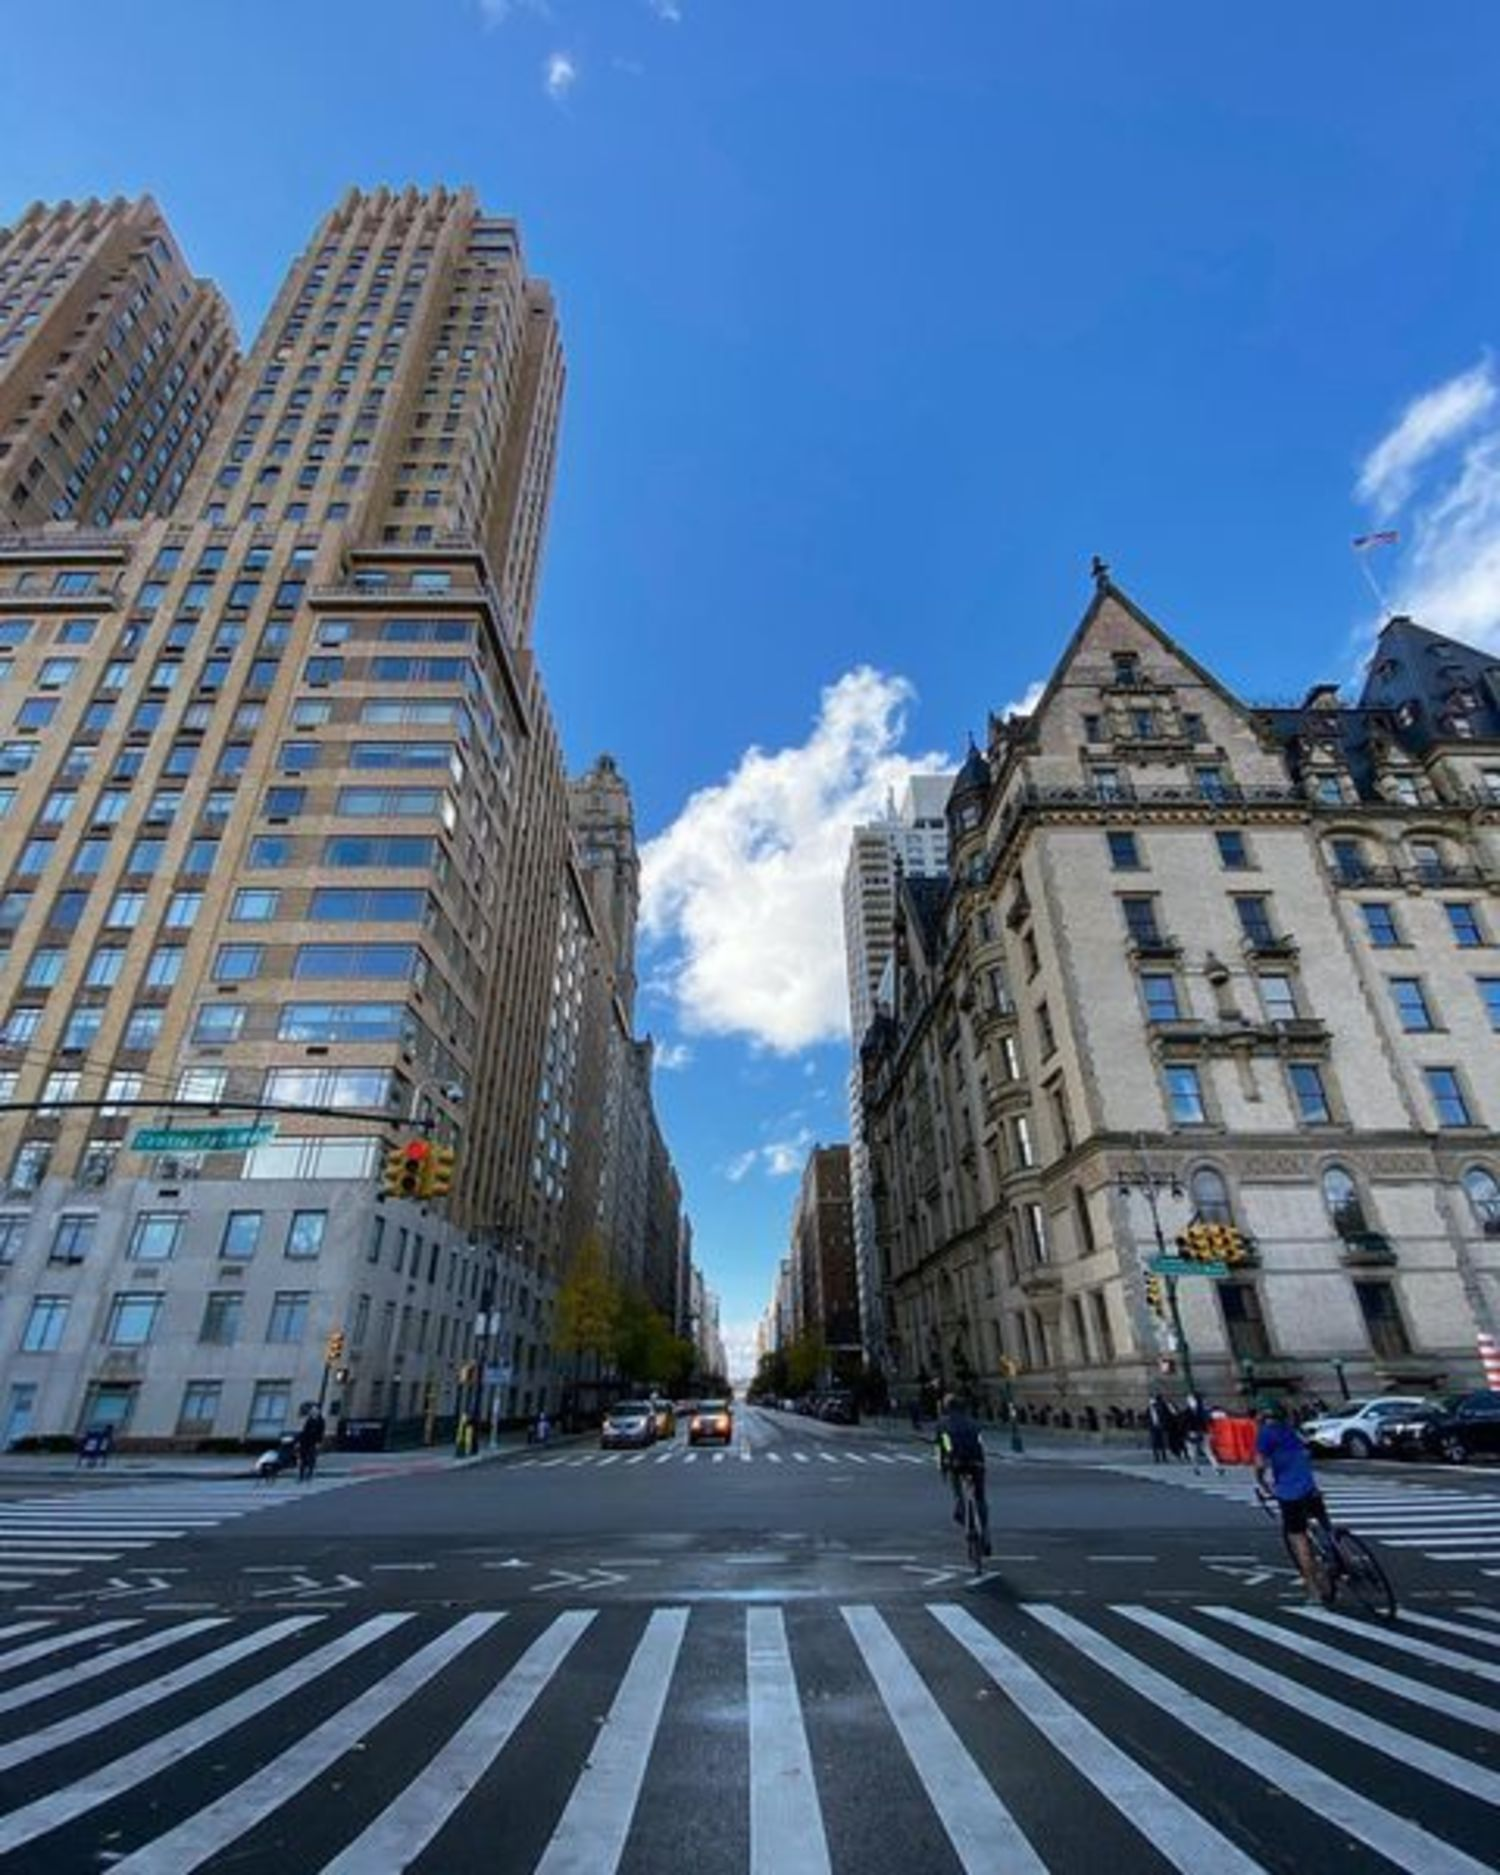 Central Park West and 72nd Street, Upper West Side, Manhattan